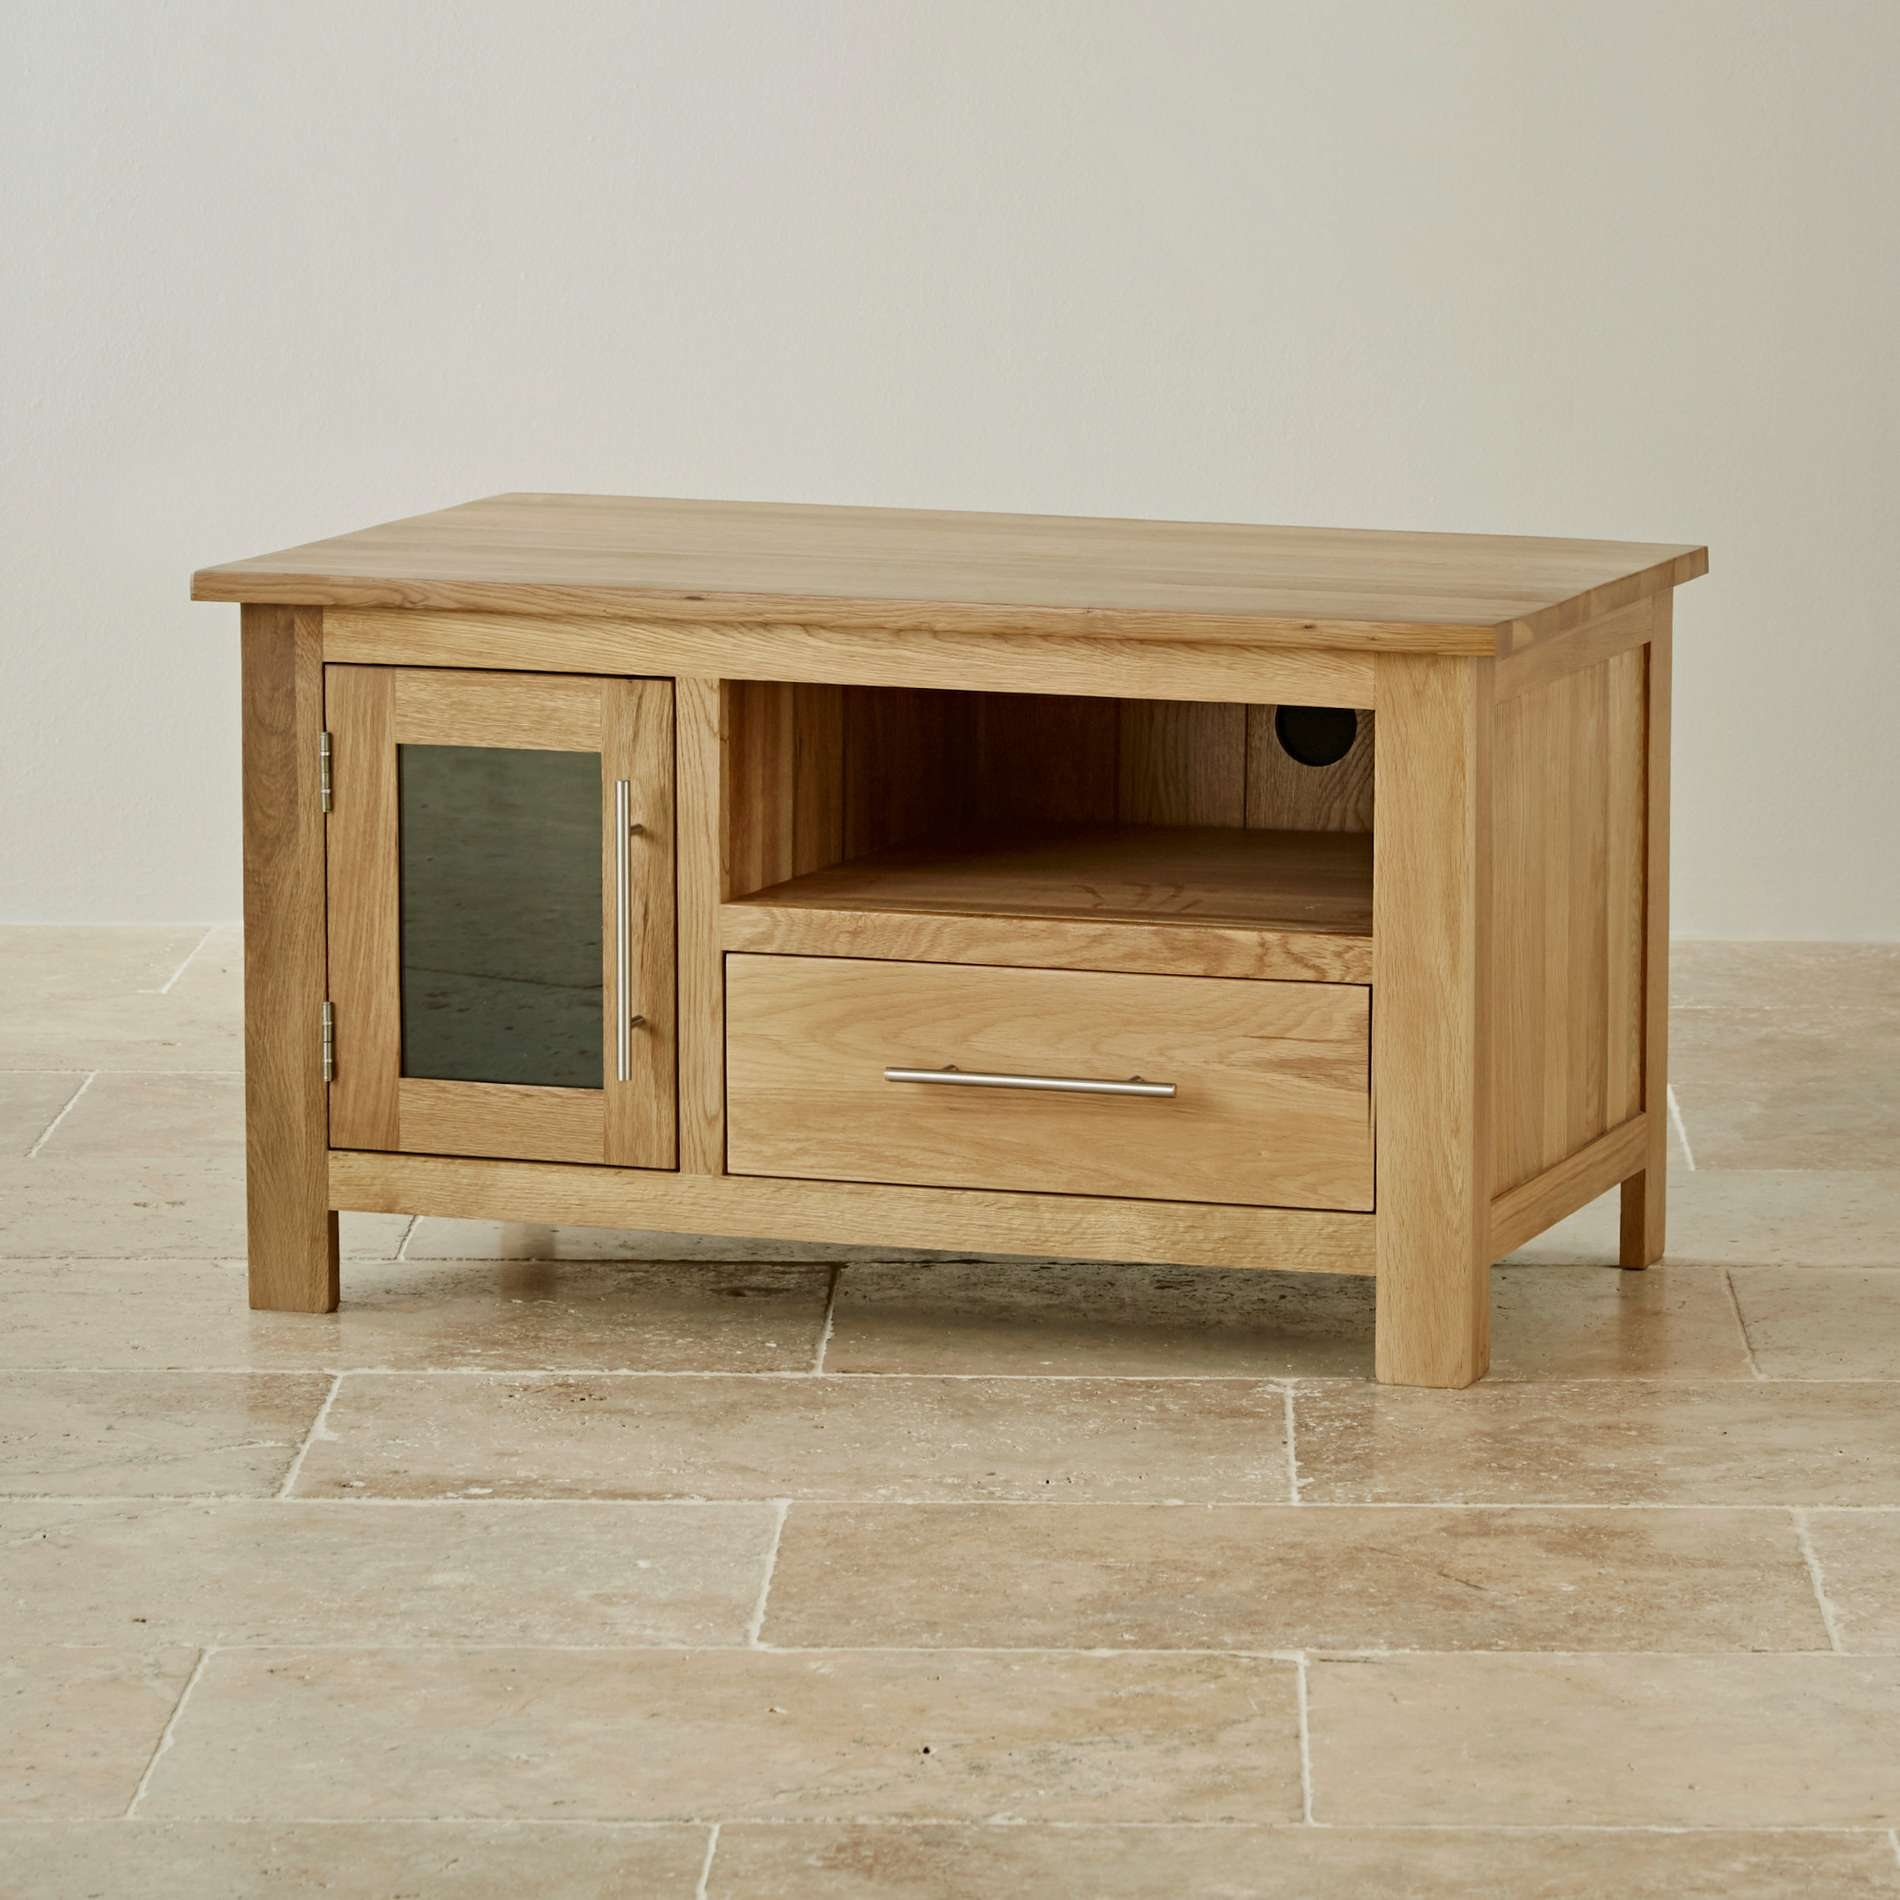 Tv Cabinets   Mango, Painted & Oak Tv Units   Oak Furniture Land In Light Oak Corner Tv Cabinets (View 11 of 20)